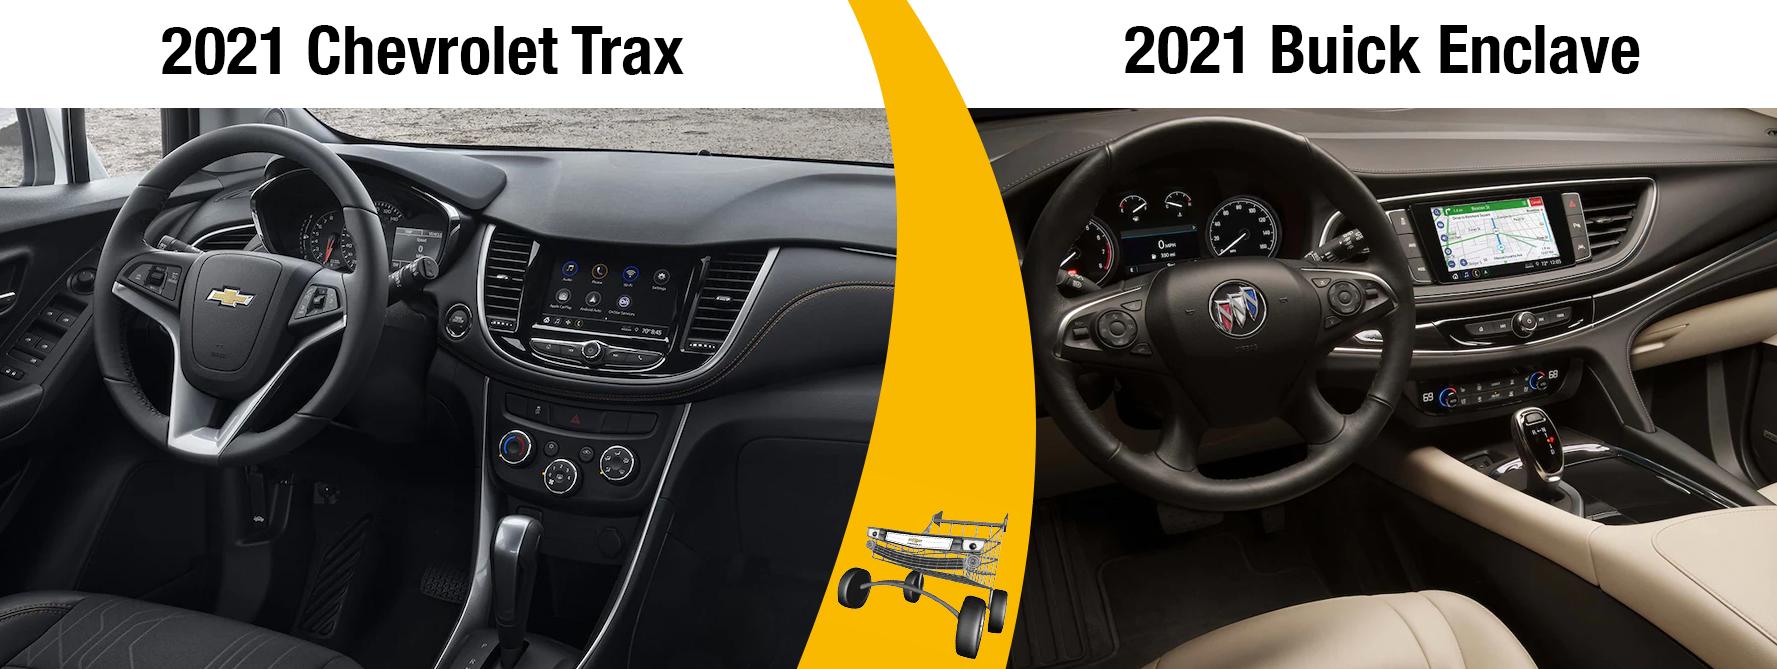 New 2021 Chevrolet Trax Vs 2021 Buick Enclave Comparisons